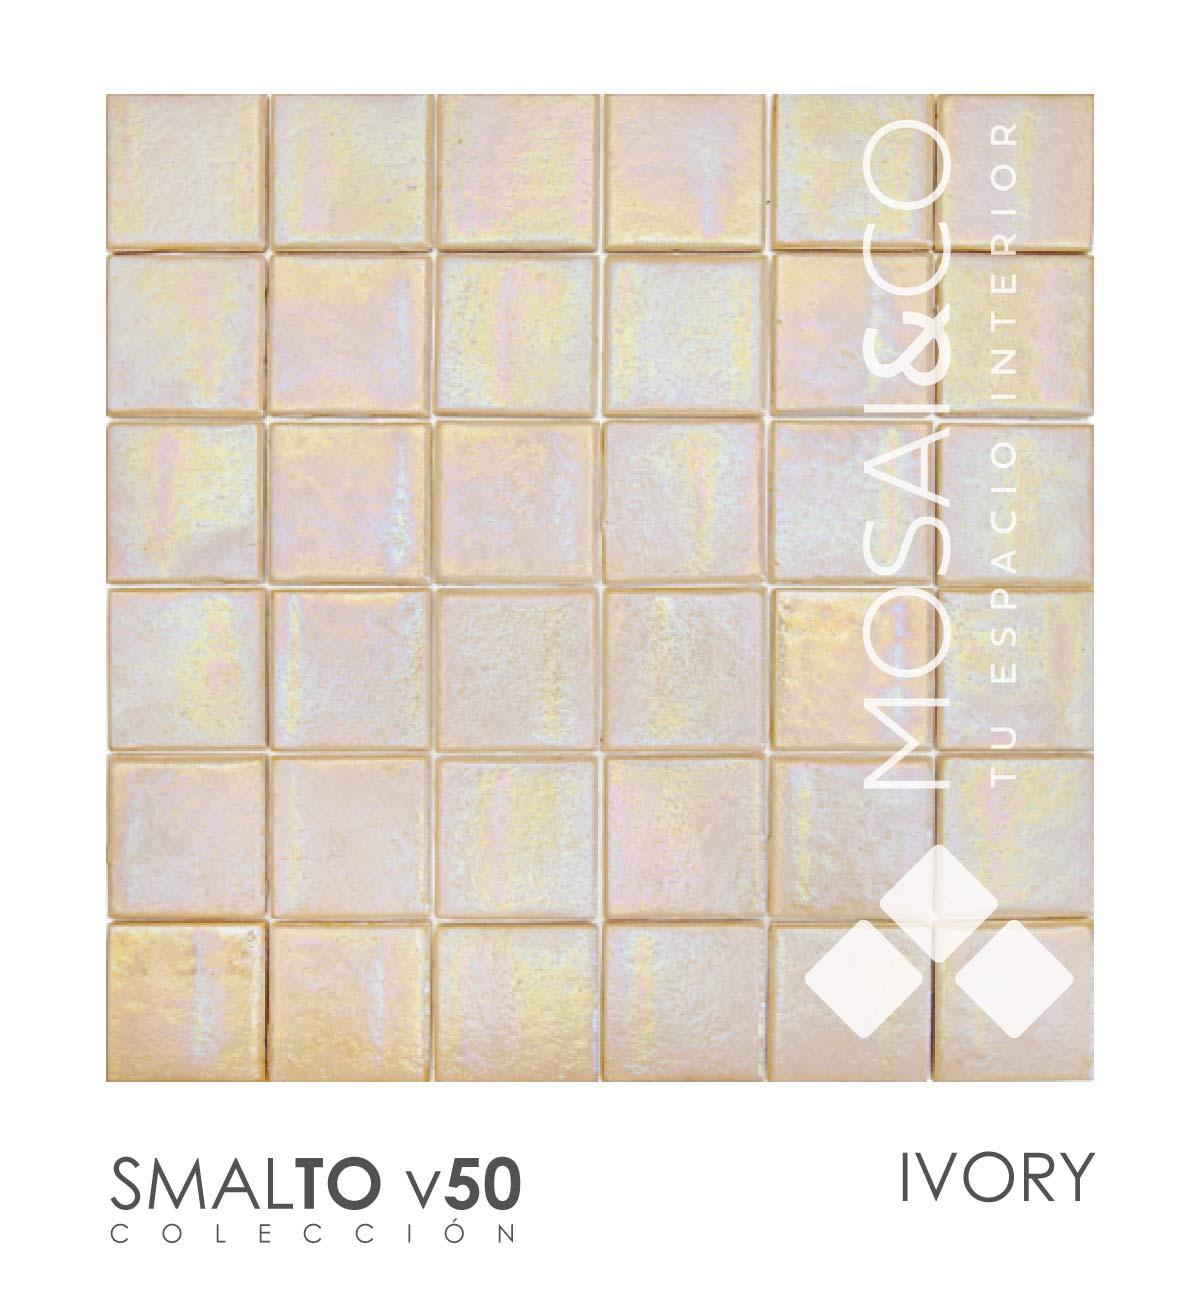 mosaico-decoracion-interiores-mosaiandco-coleccion-smalto_v50-IVORY